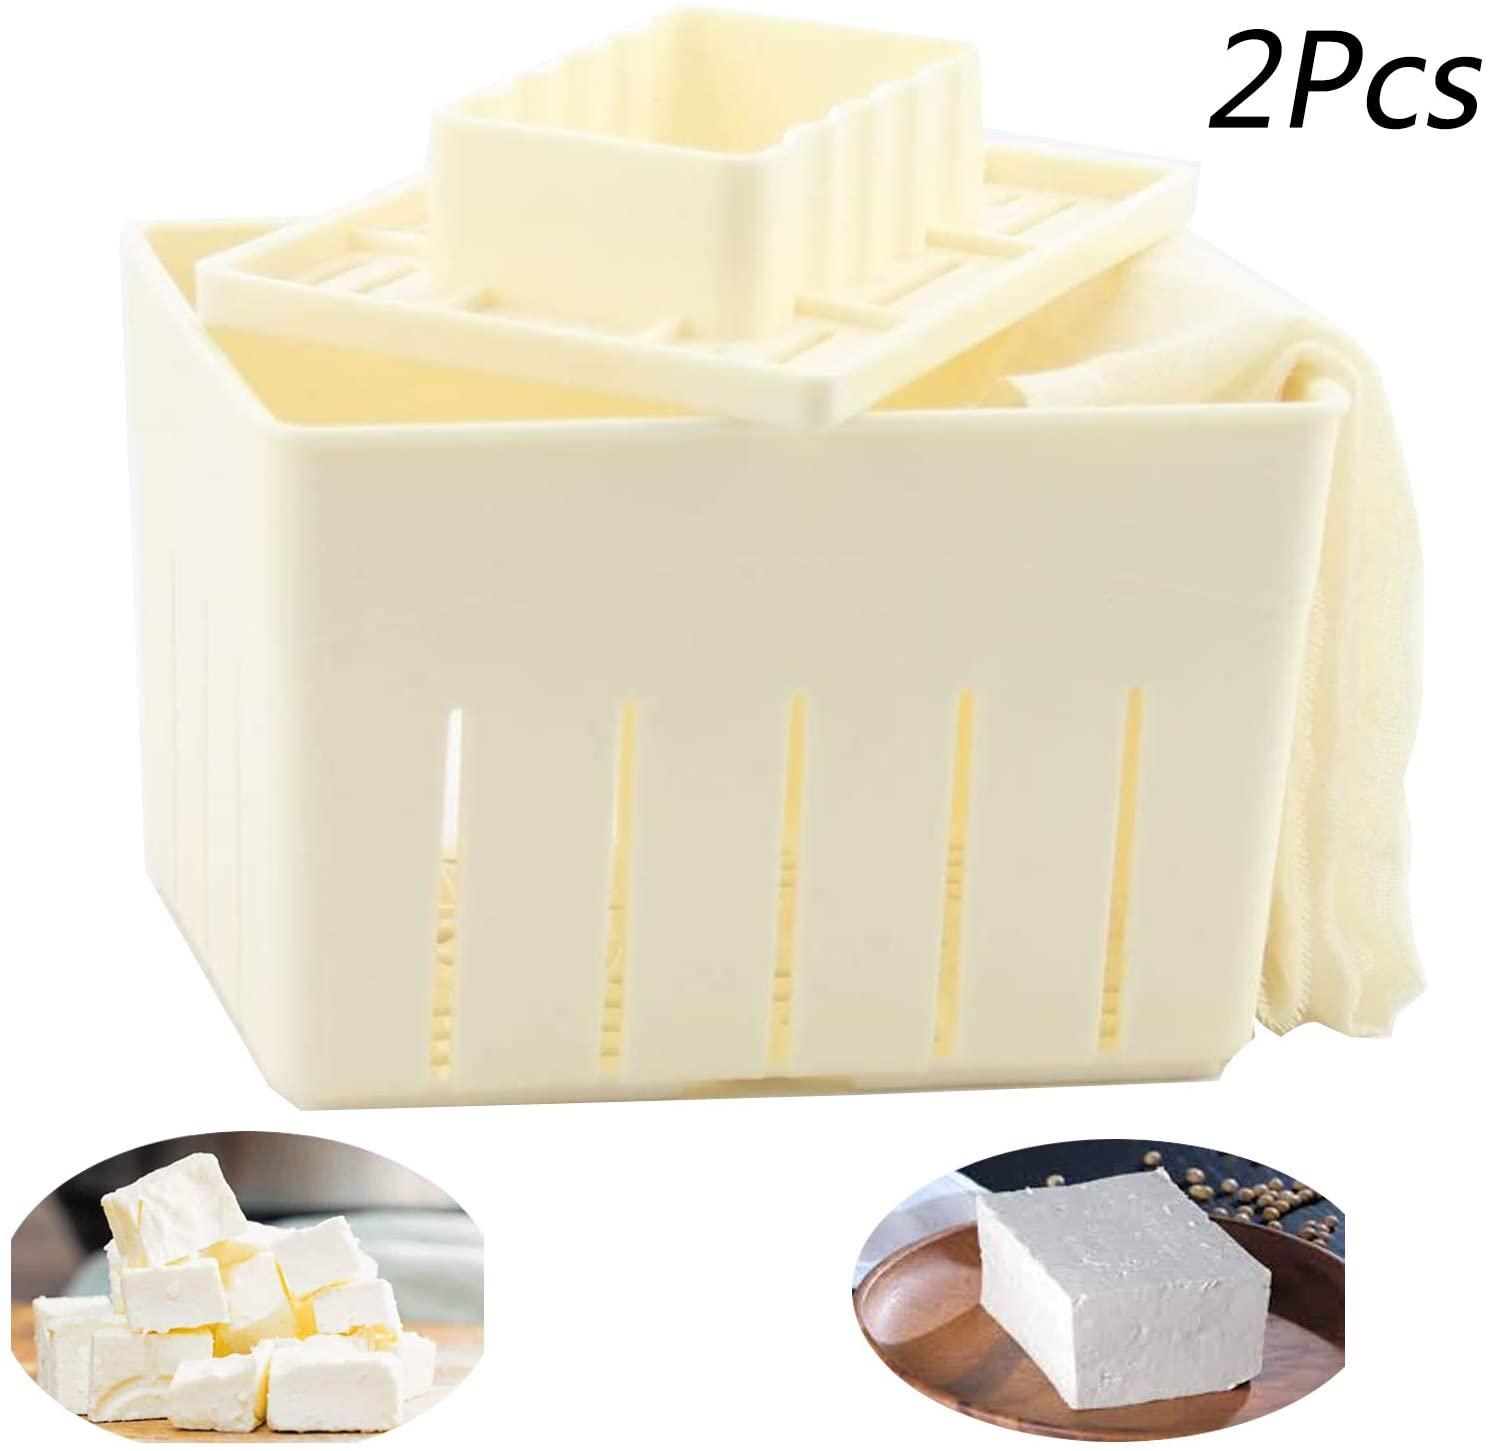 Tofu Press Mould 2PCS Plastic DIY Homemade Tofu Maker Pressing Mold Kit +Soybean Curd Cheese Cloth Kitchen Tools